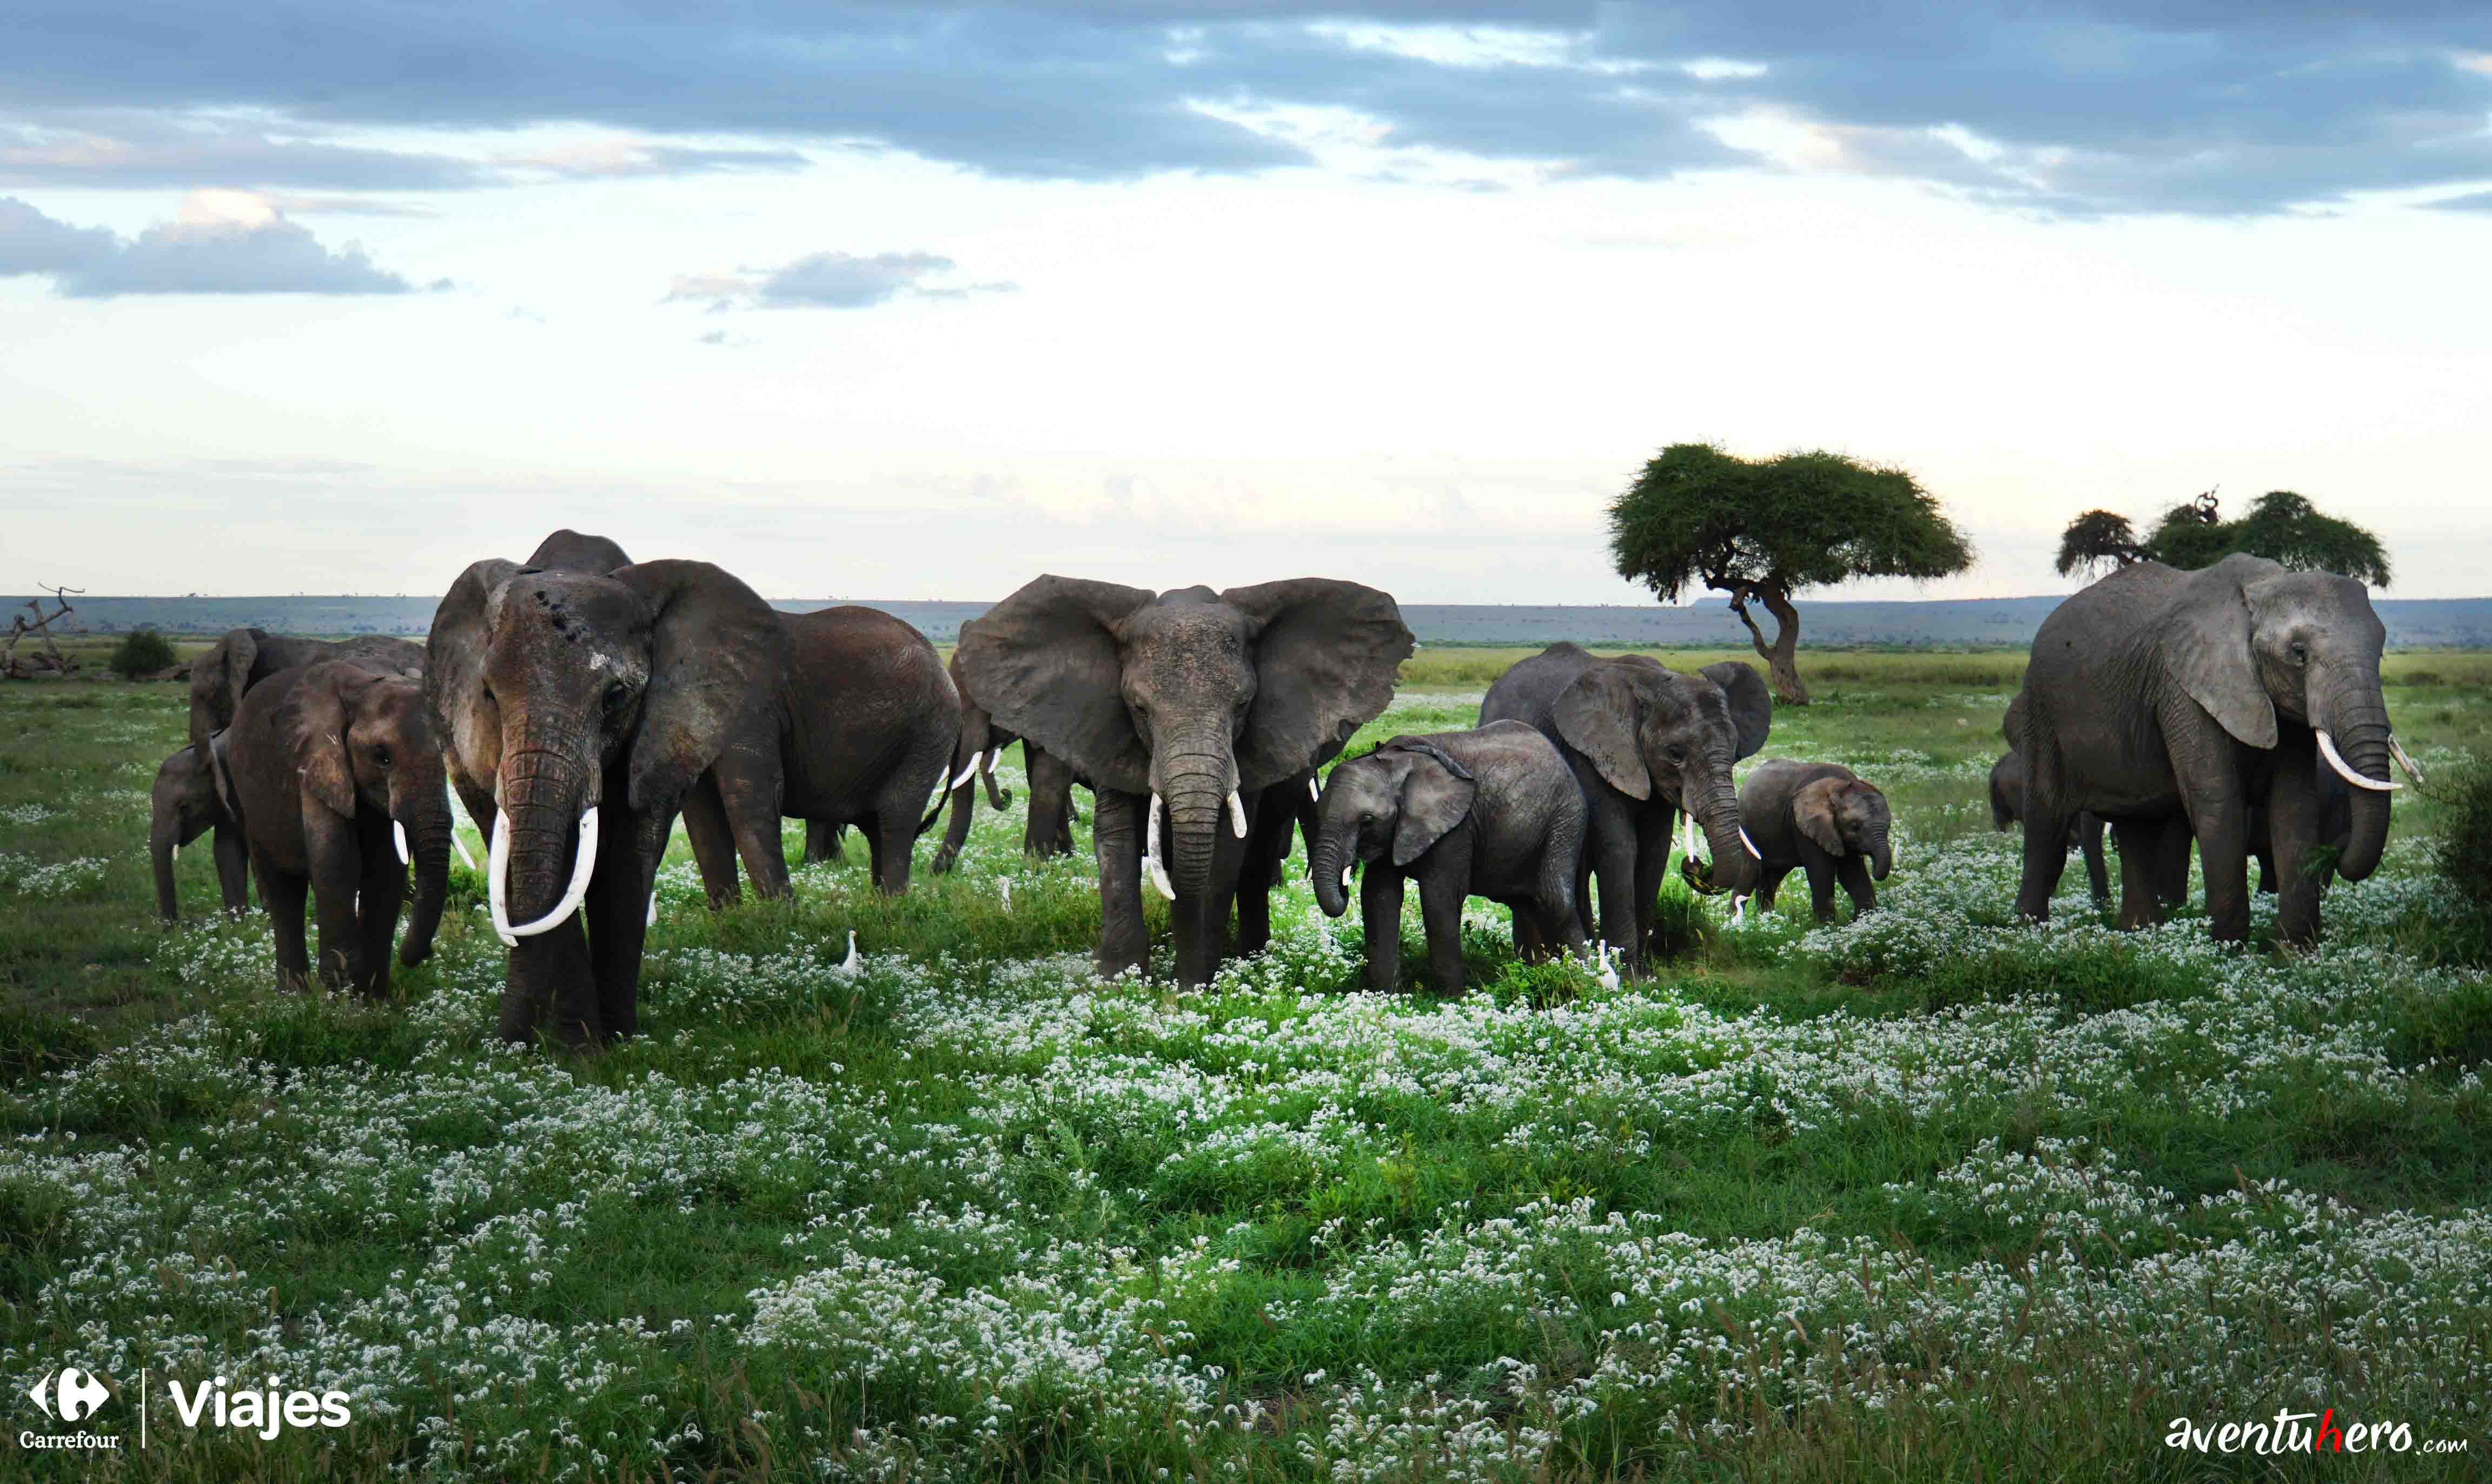 elefantes de frente a la camara durante un safari en la reserva Amboseli